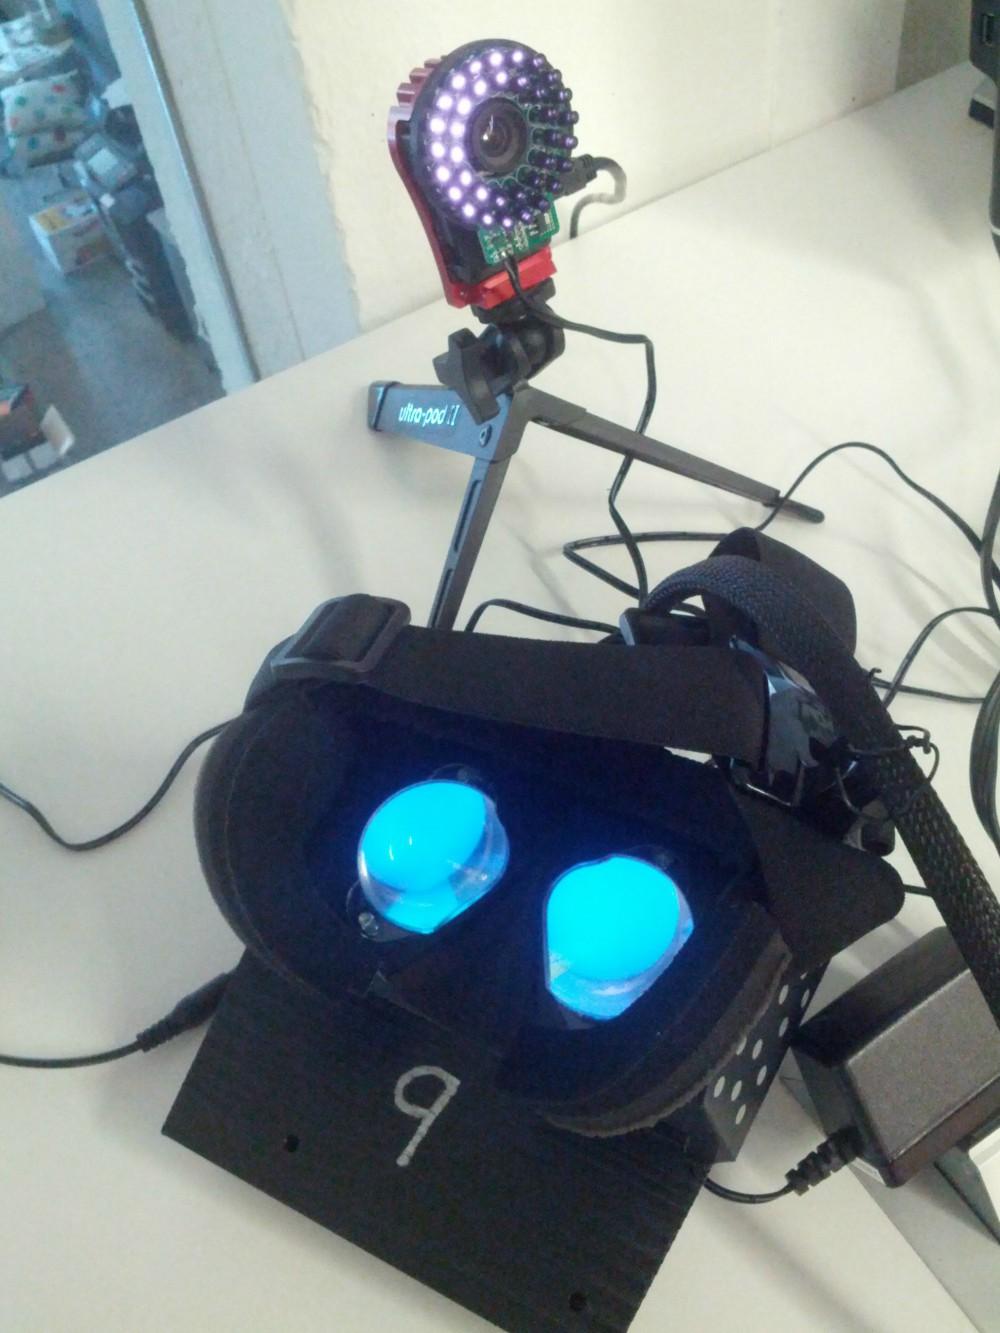 VR-шлем от Valve